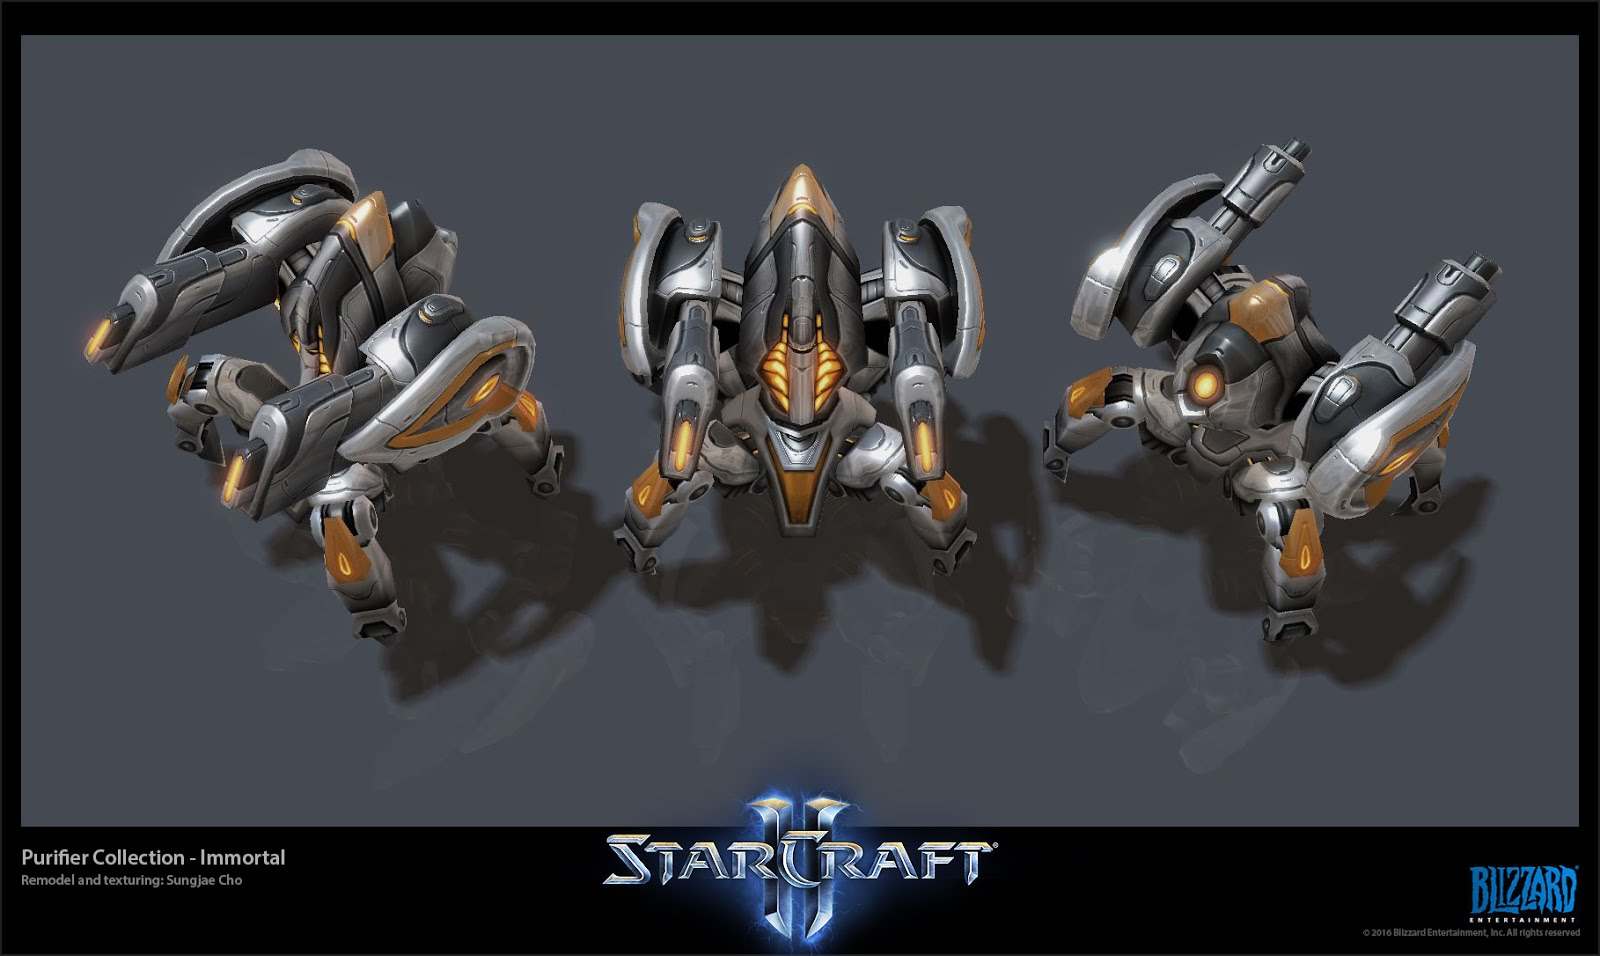 Nospennia Starcraft Warchest Skins For New Coops